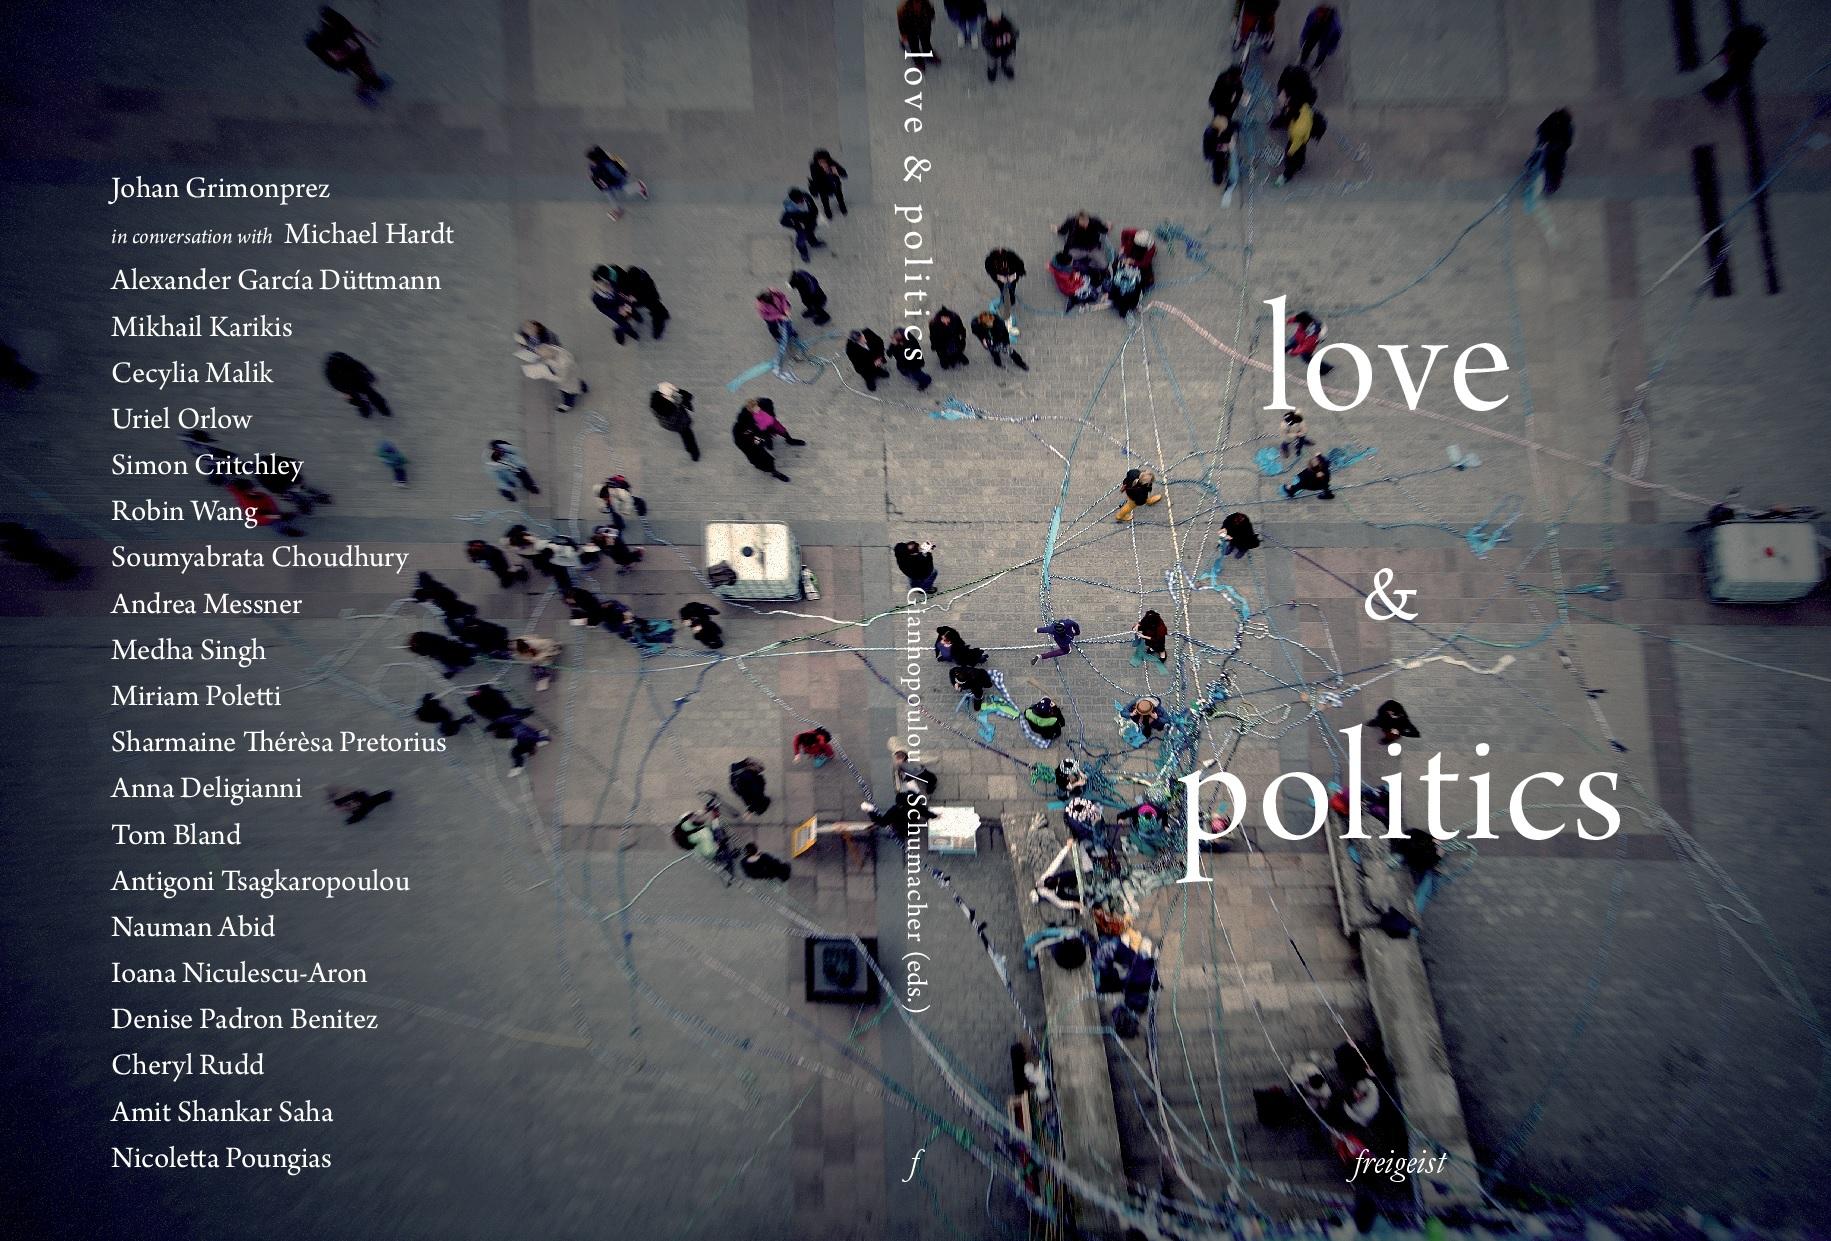 love & politics cover full von